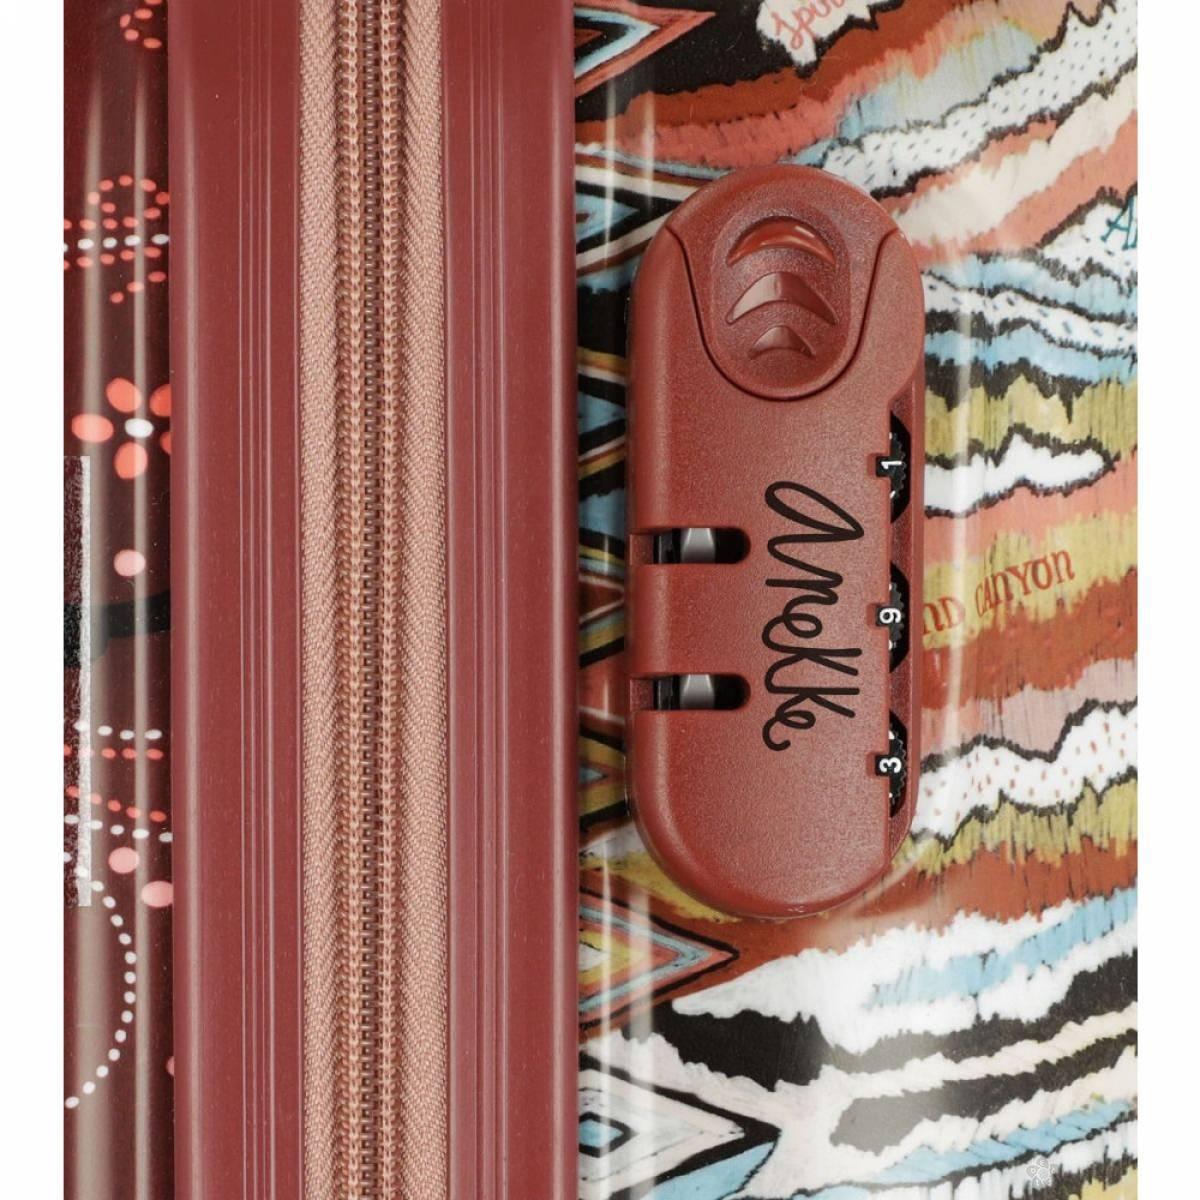 Kofer Anekke Arizona 94103, manji